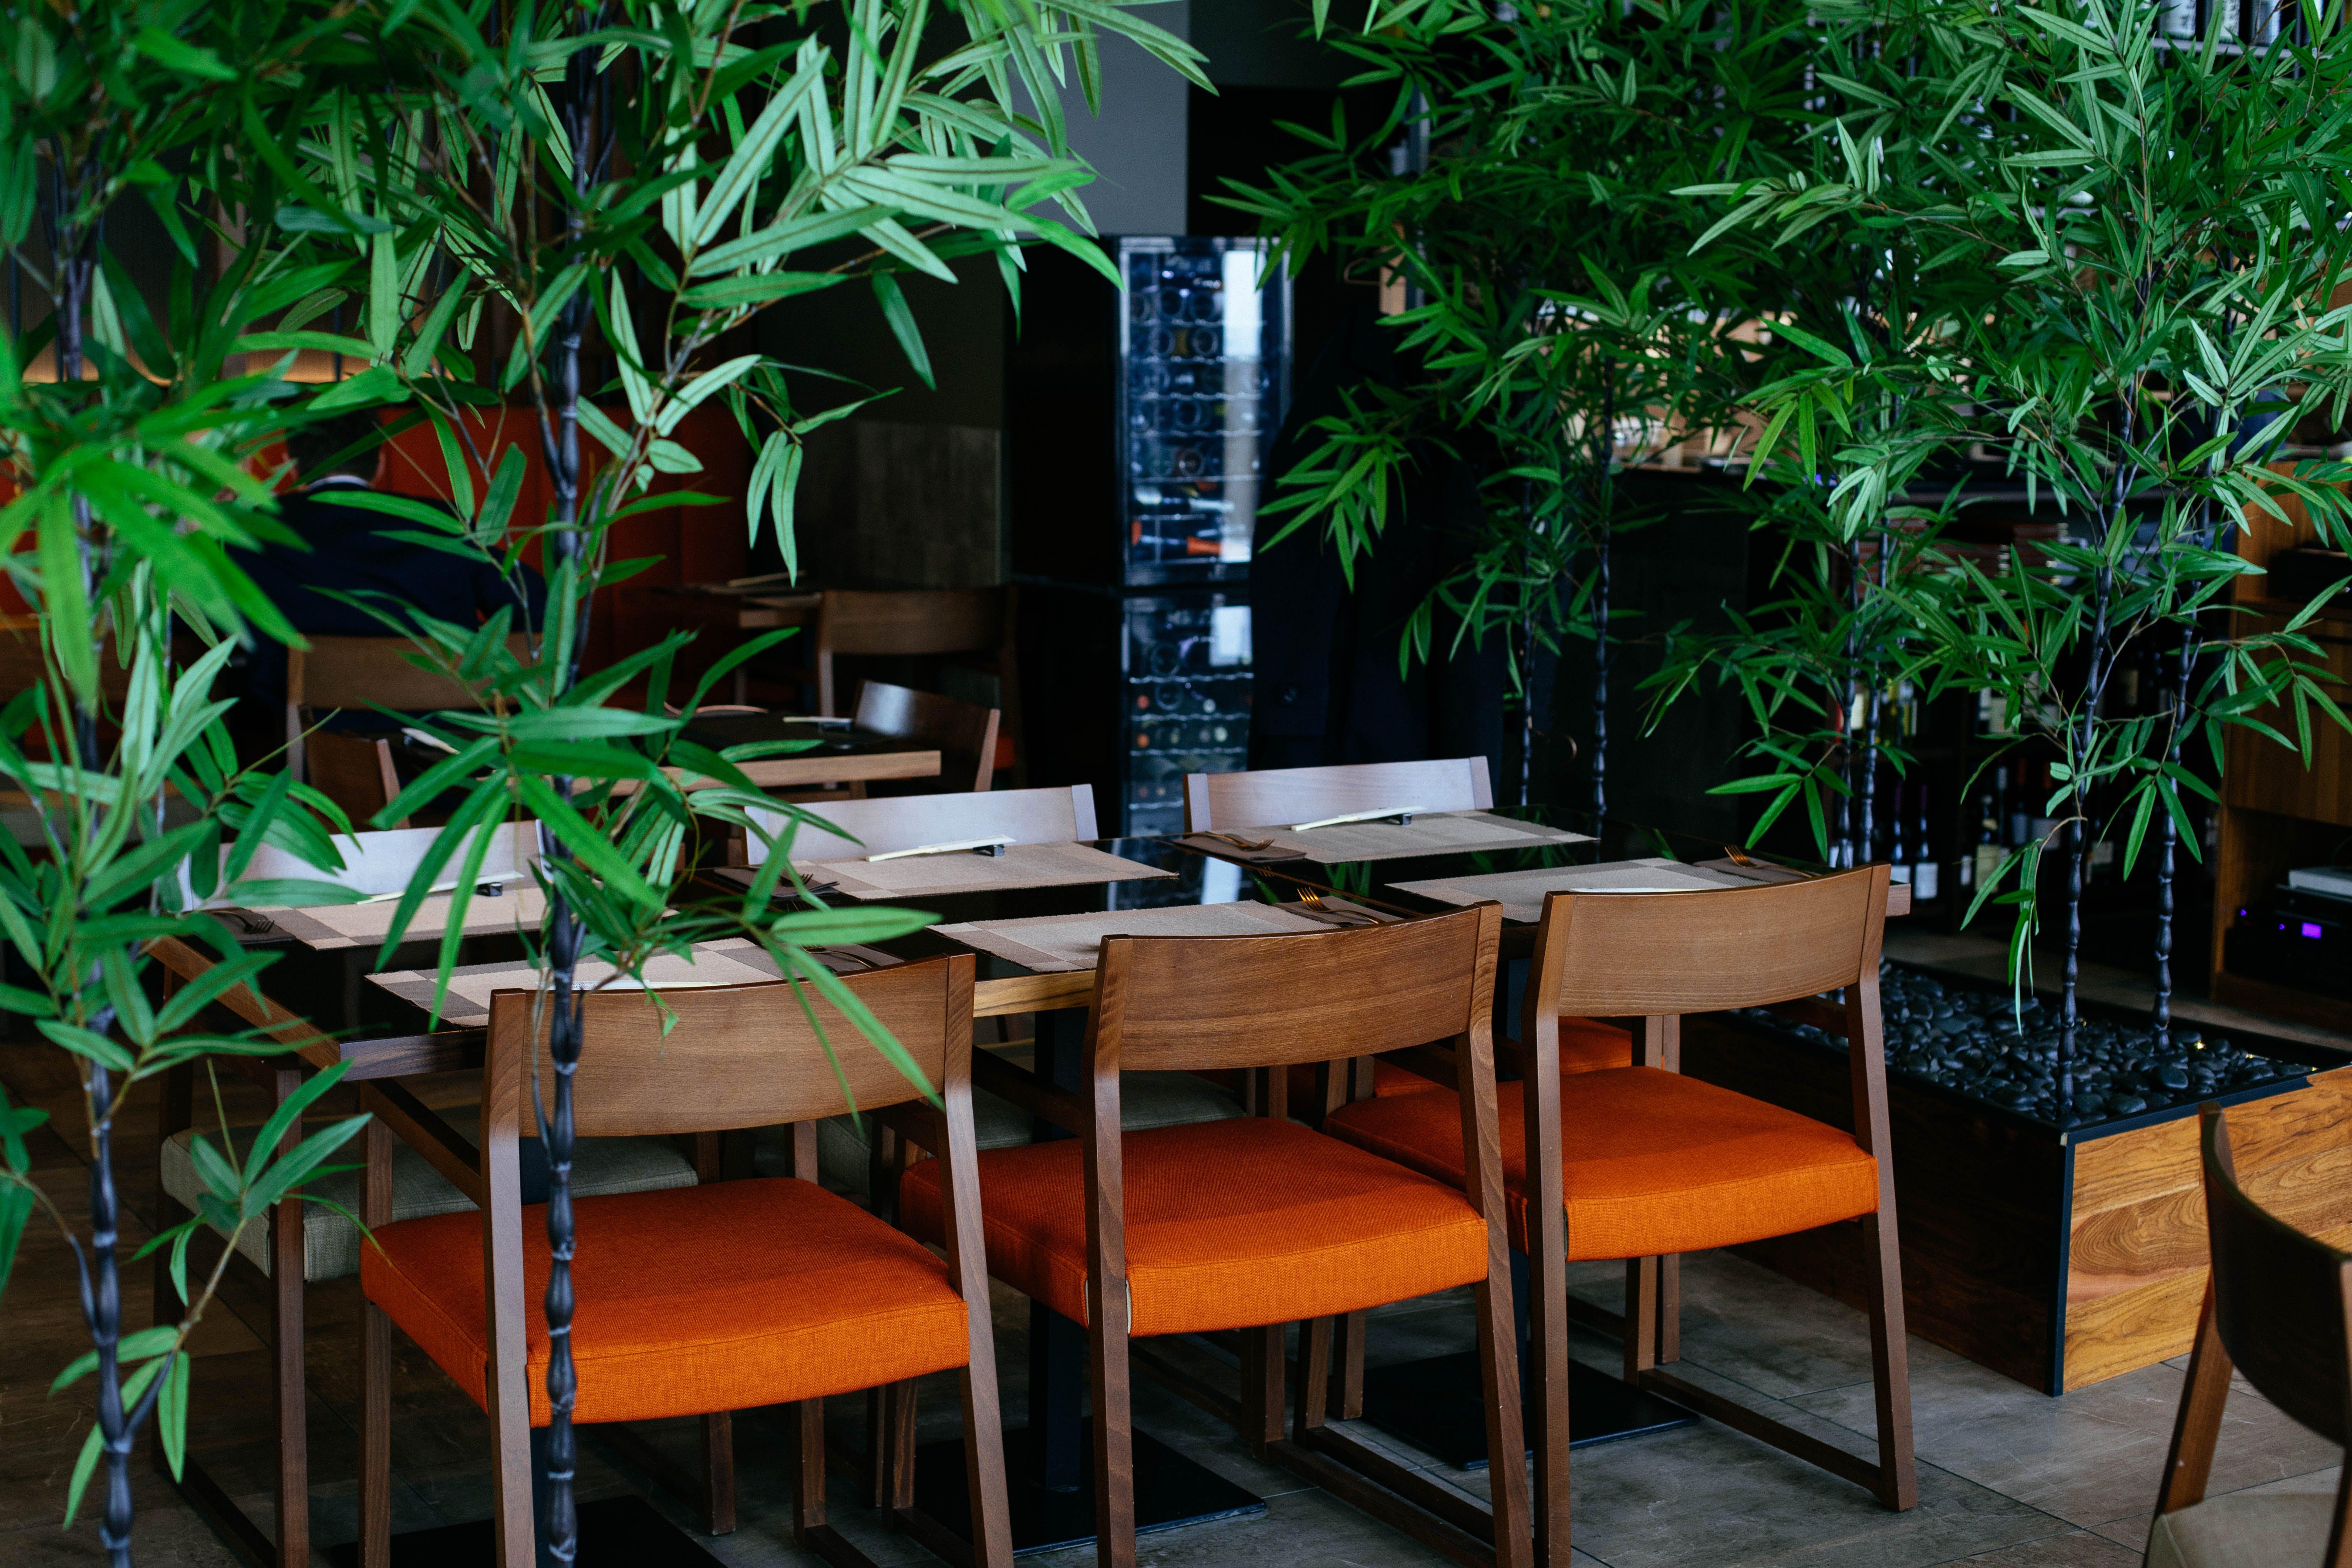 Chairs Near Plants